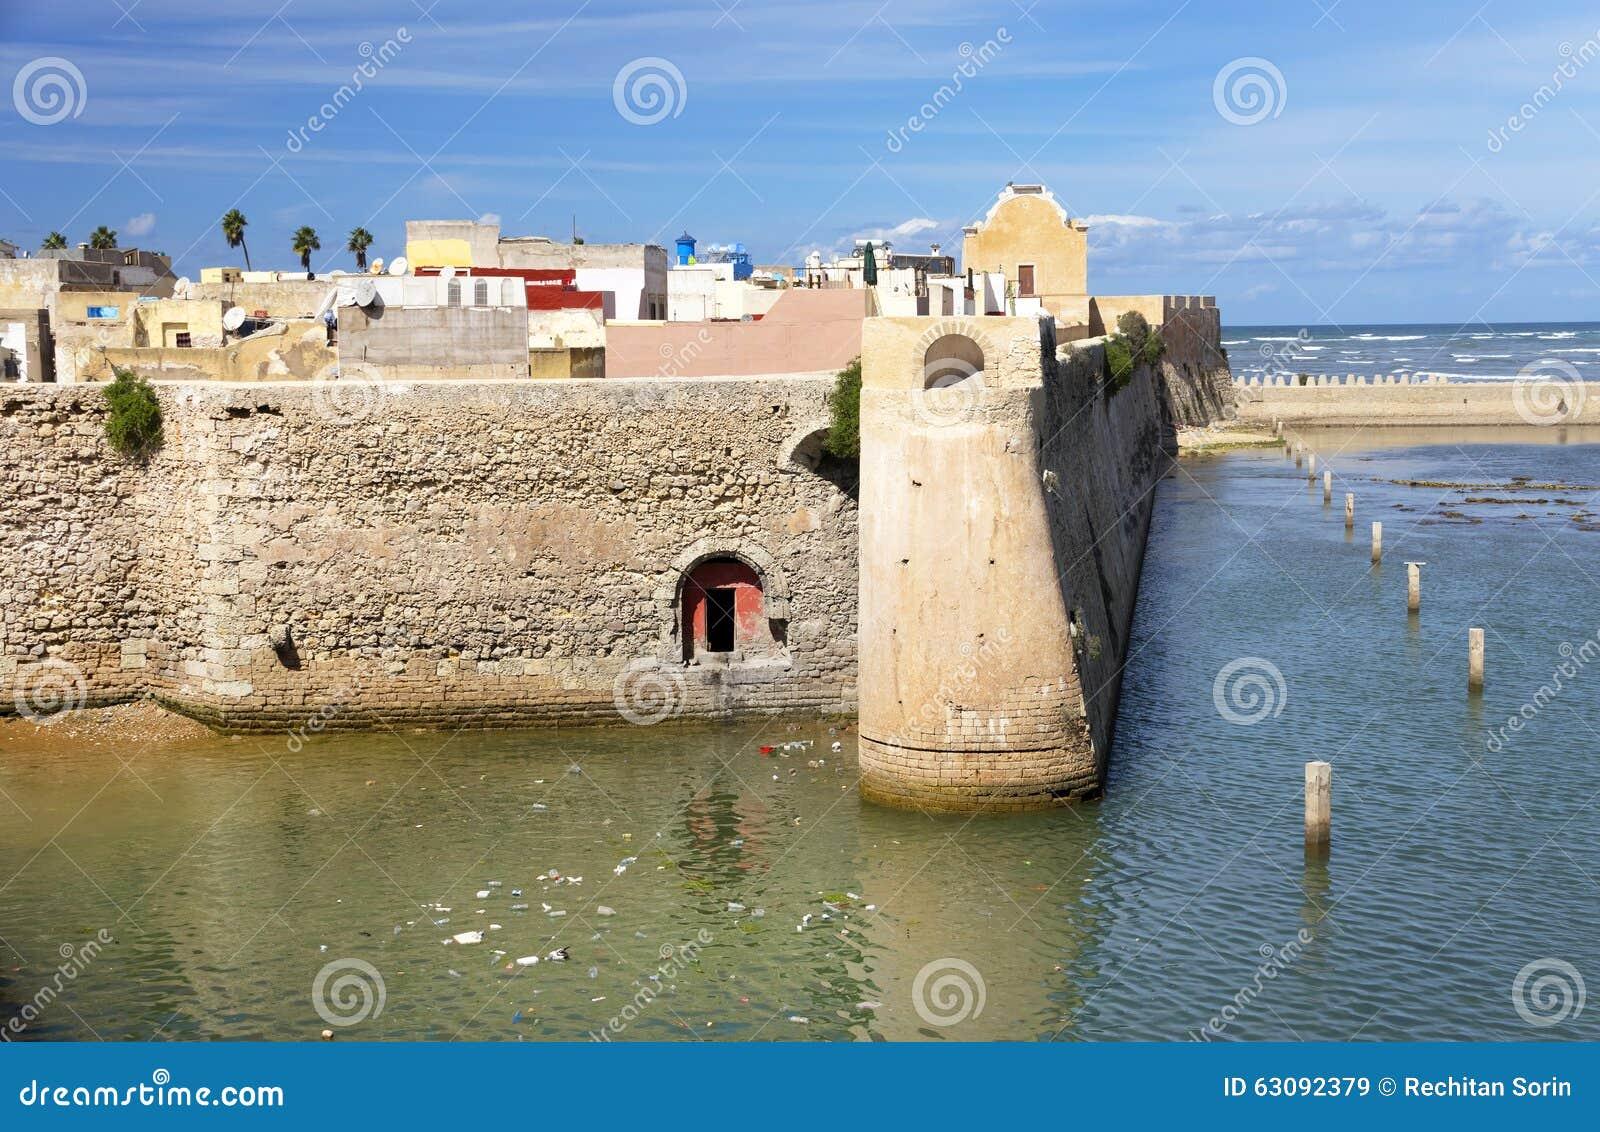 Download Détail Architectural De Mazagan, EL Jadida, Maroc Image stock - Image du culture, marocain: 63092379